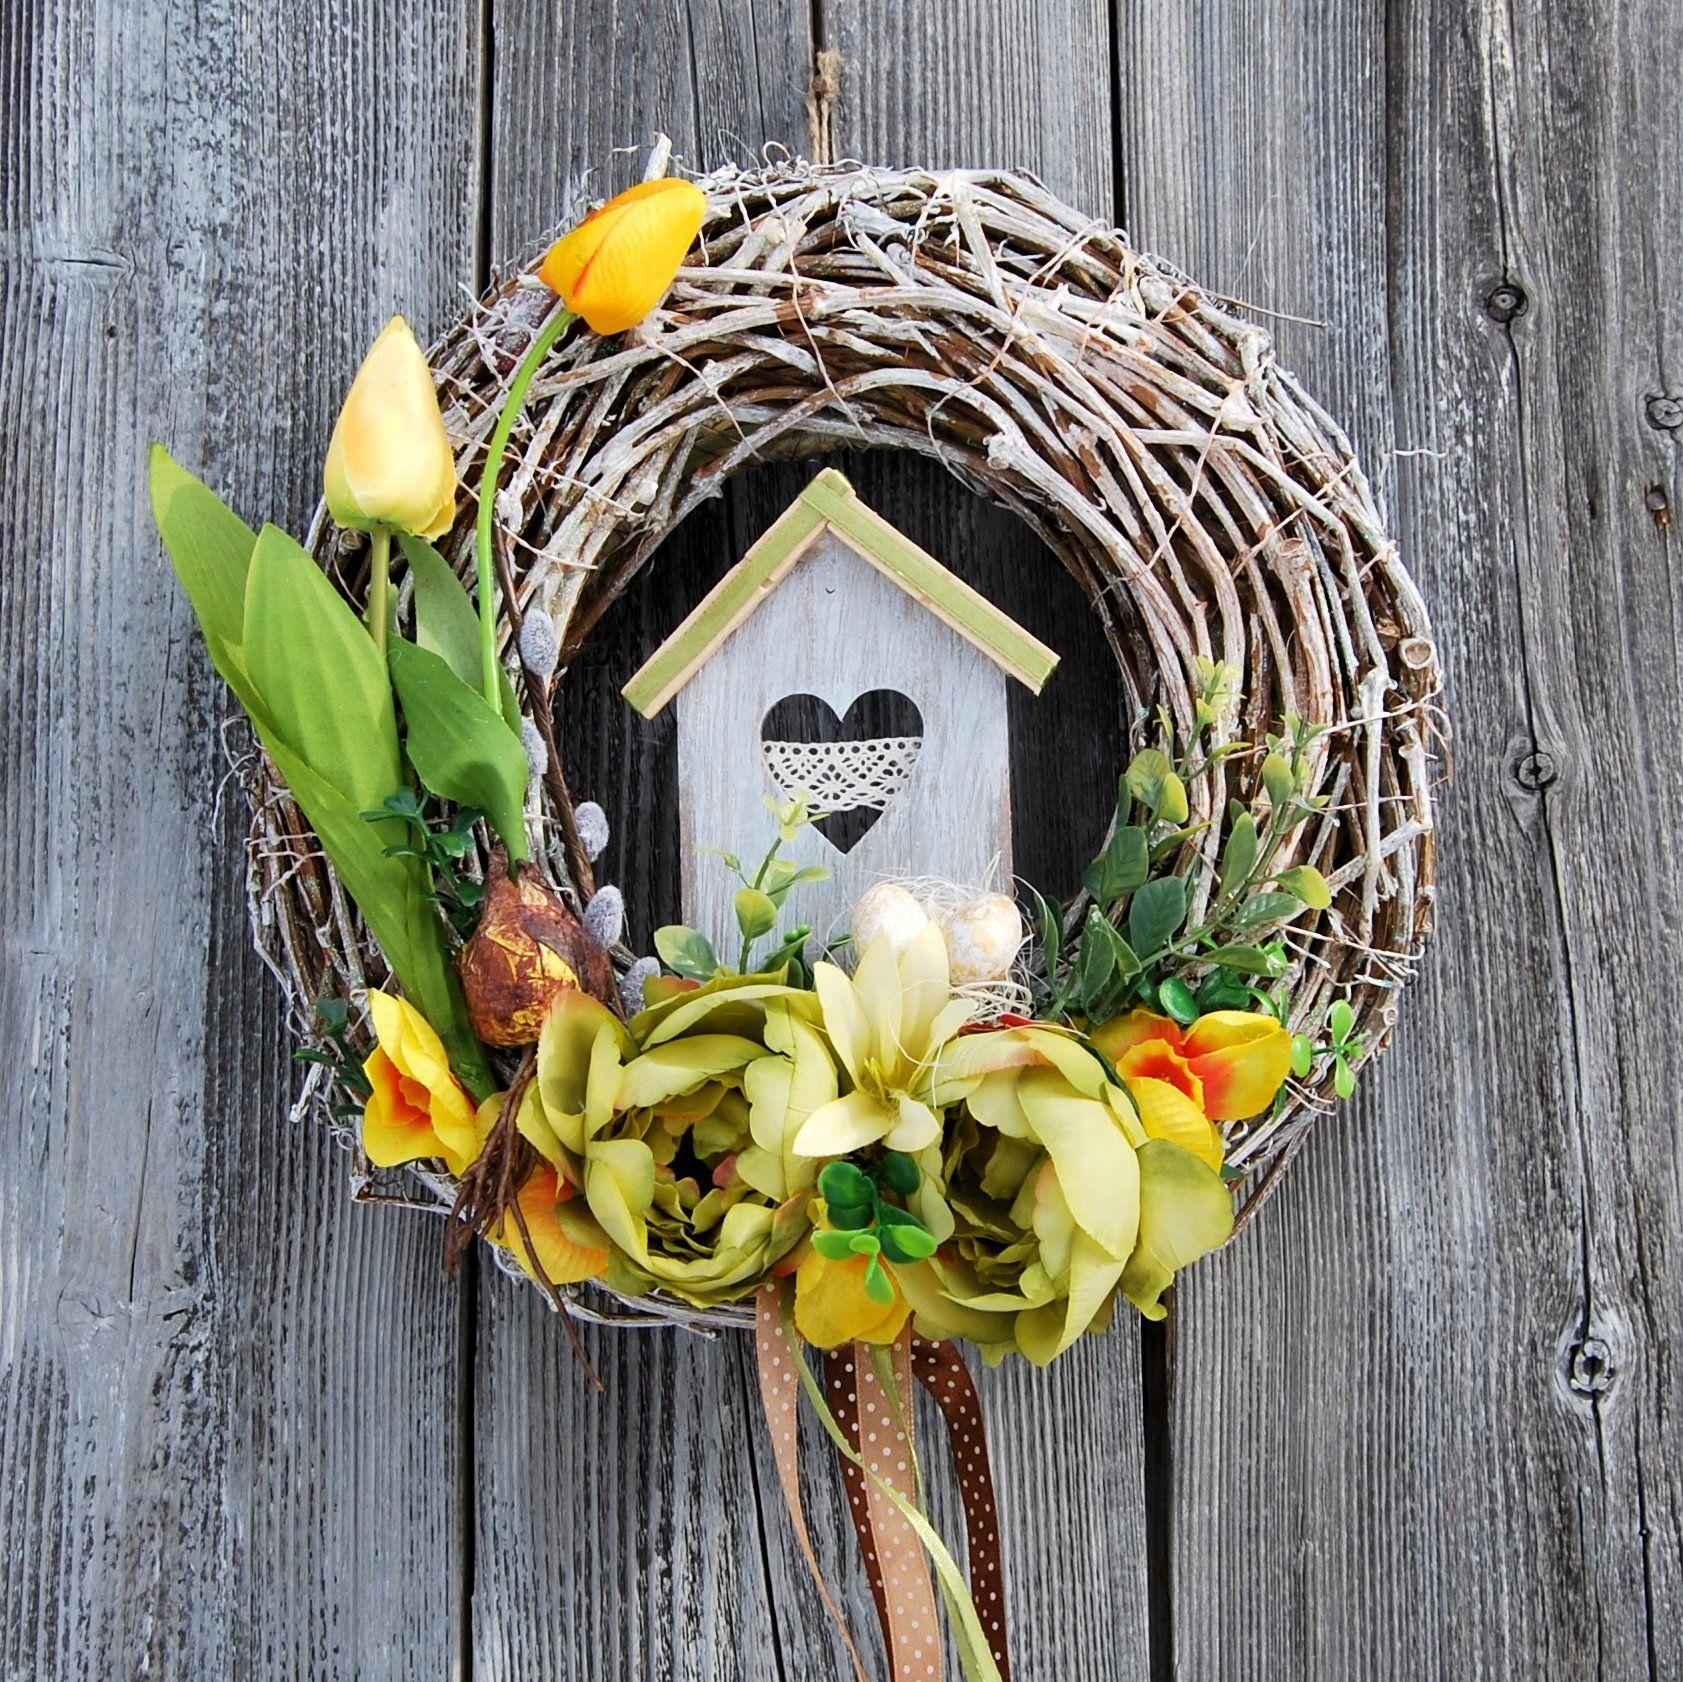 Wianek Wielkanocny Wianek Wielkanoc Wianek Na Drzwi Stroik